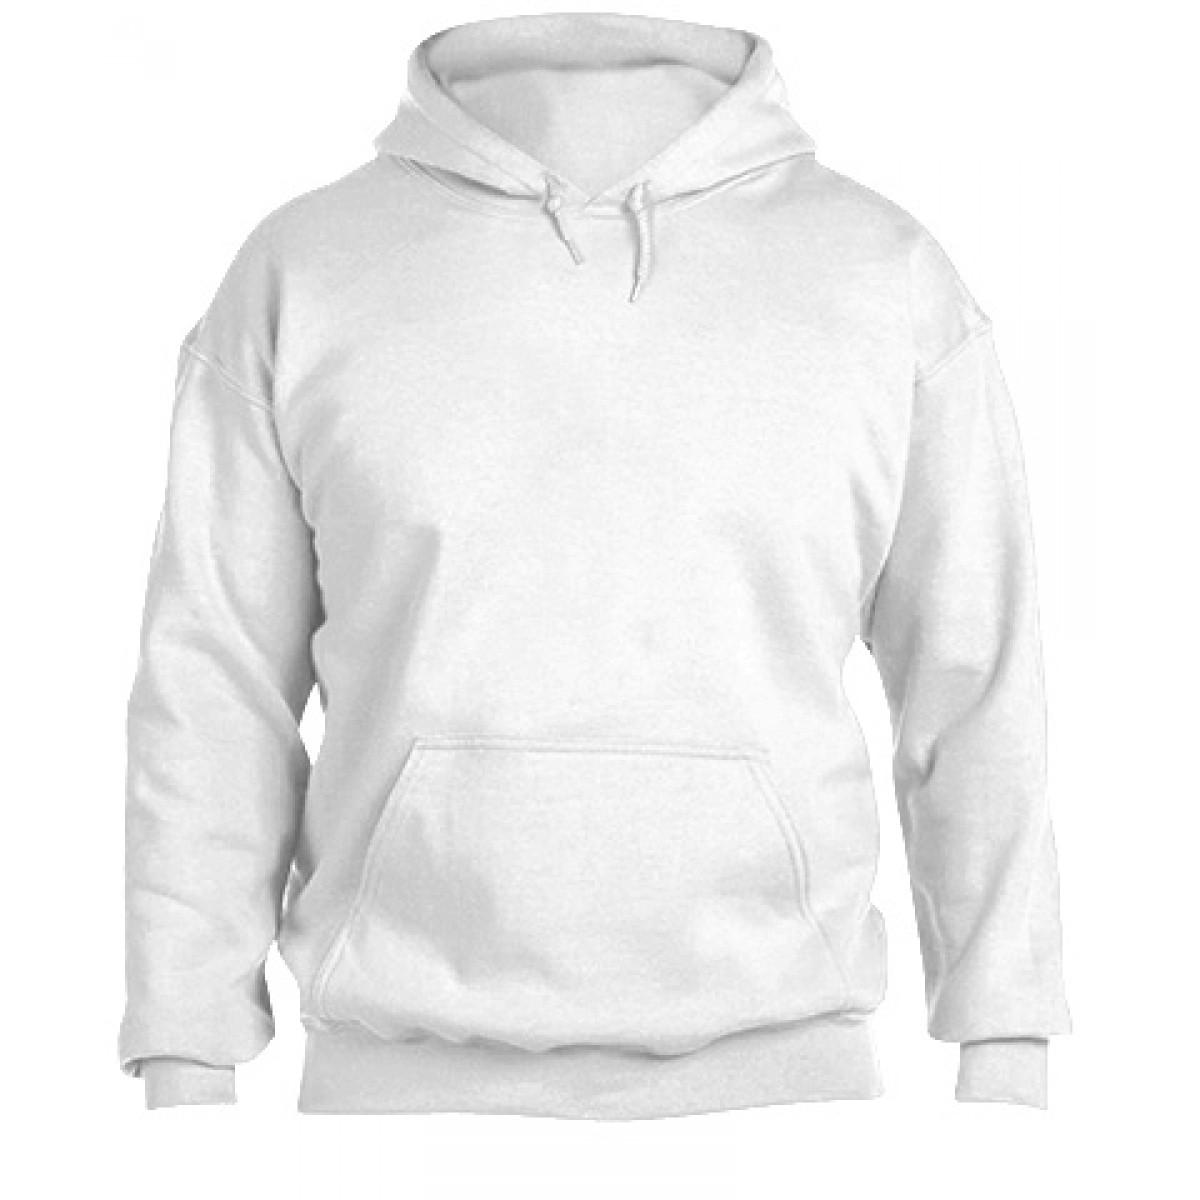 Hooded Sweatshirt 50/50 Heavy Blend -White-L